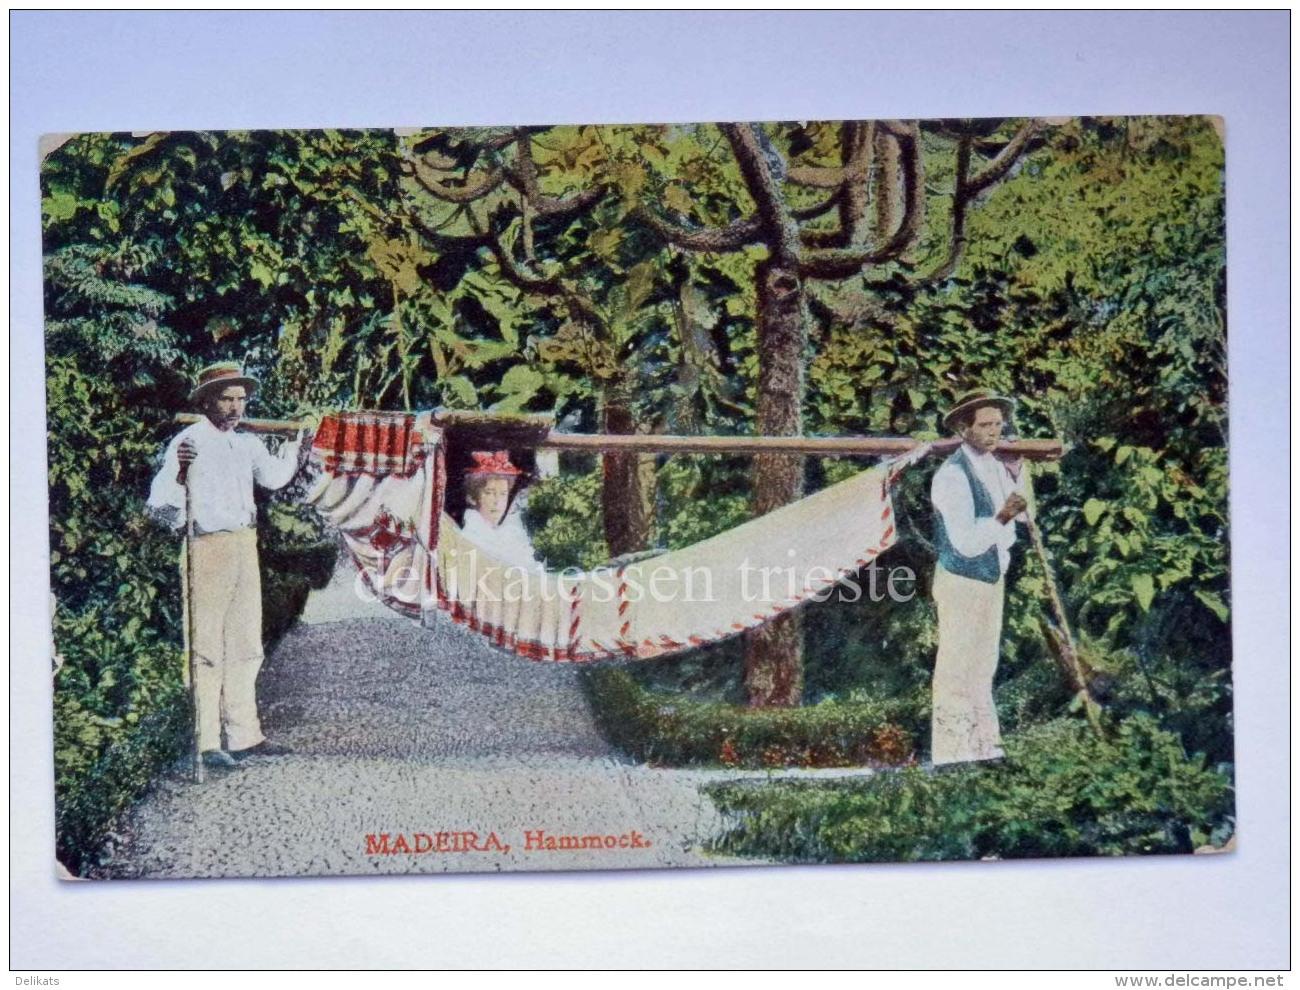 PORTOGALLO PORTUGAL Madeira Hammock Old Postcard - Madeira